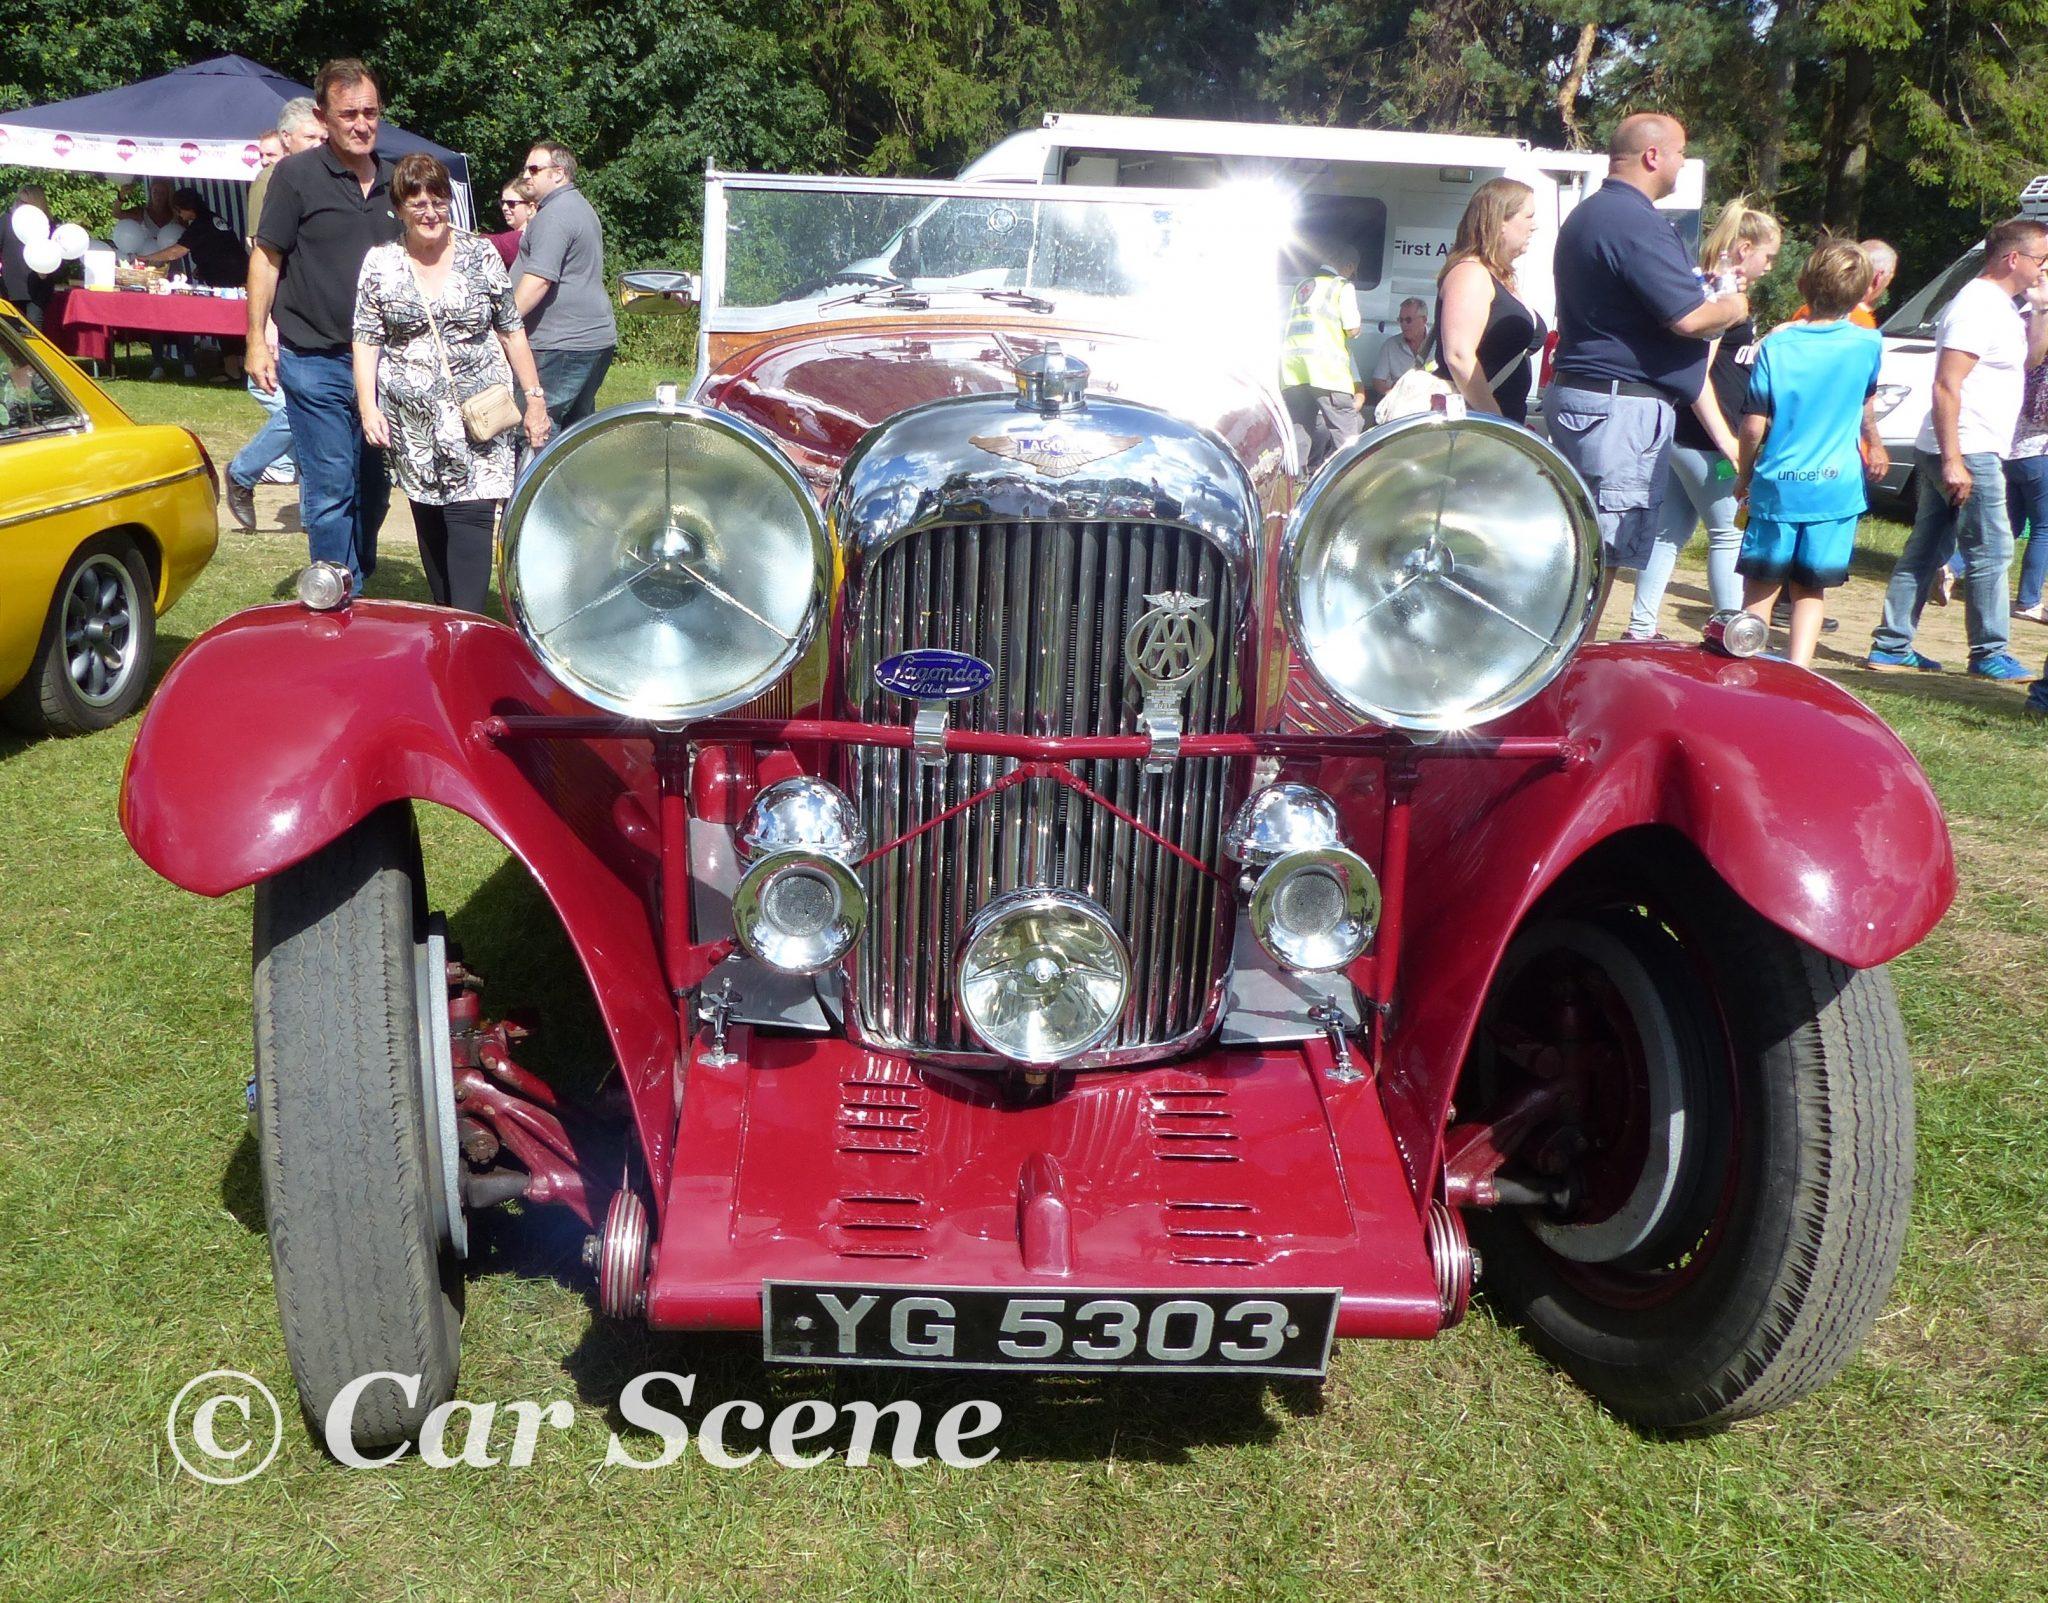 c.1934 Lagonda 4 1/2 Lltr. Tourer front view